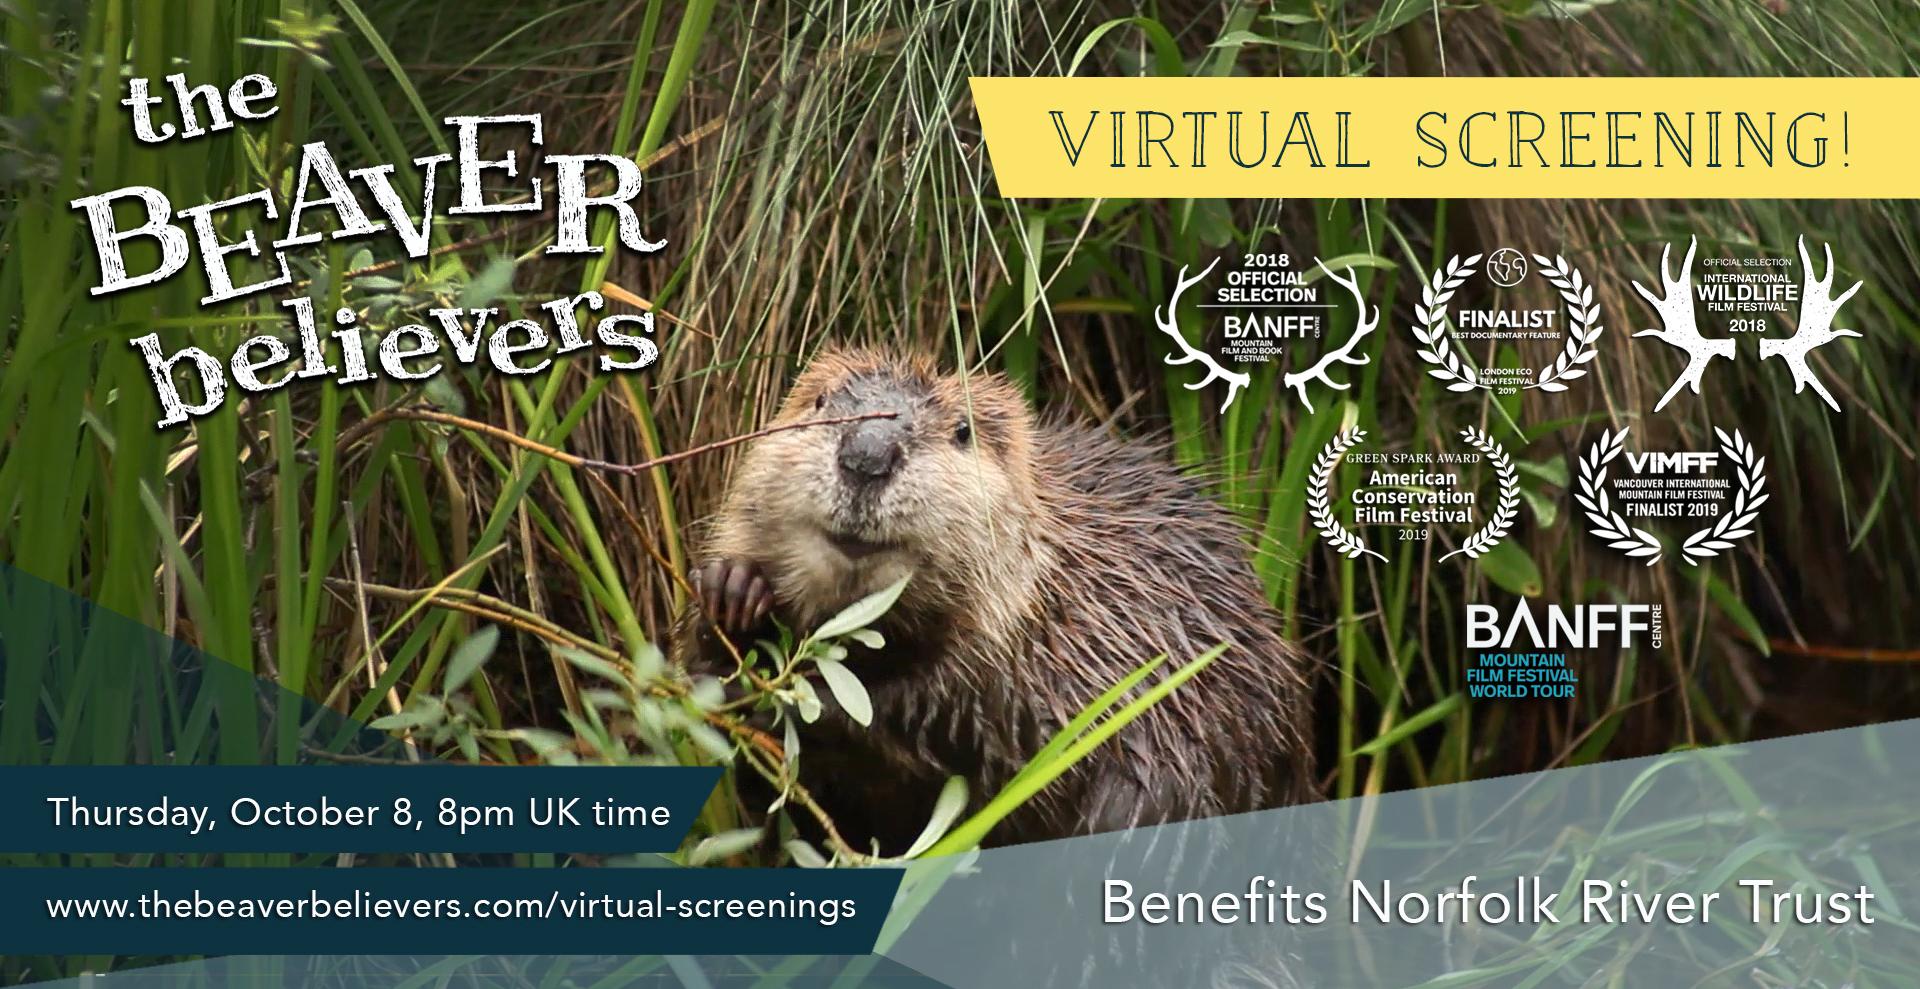 'The Beaver Believers' film screening